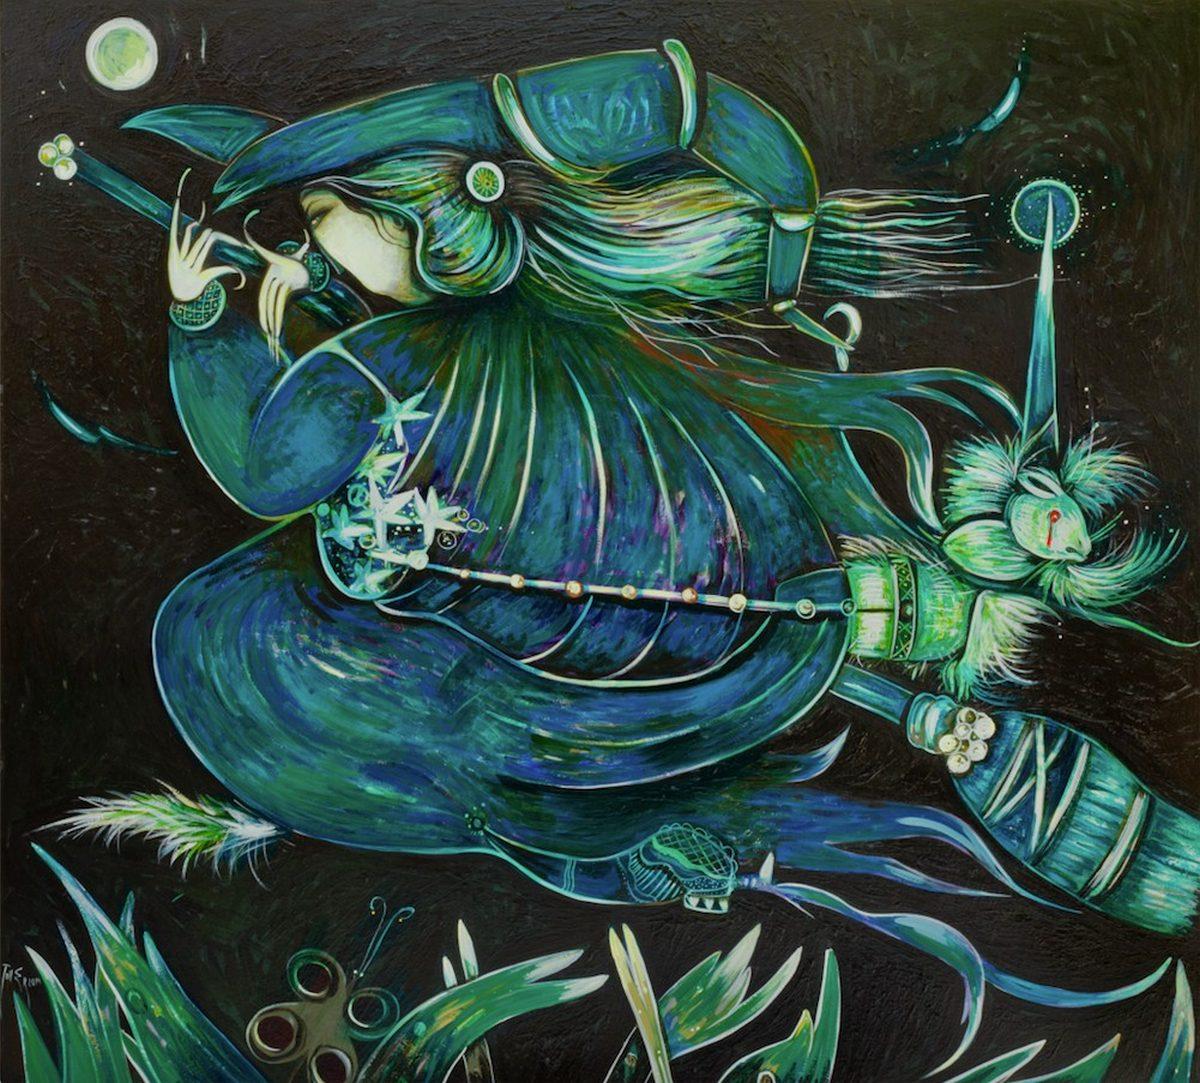 Toller Cranston - Blue Witch (2014)